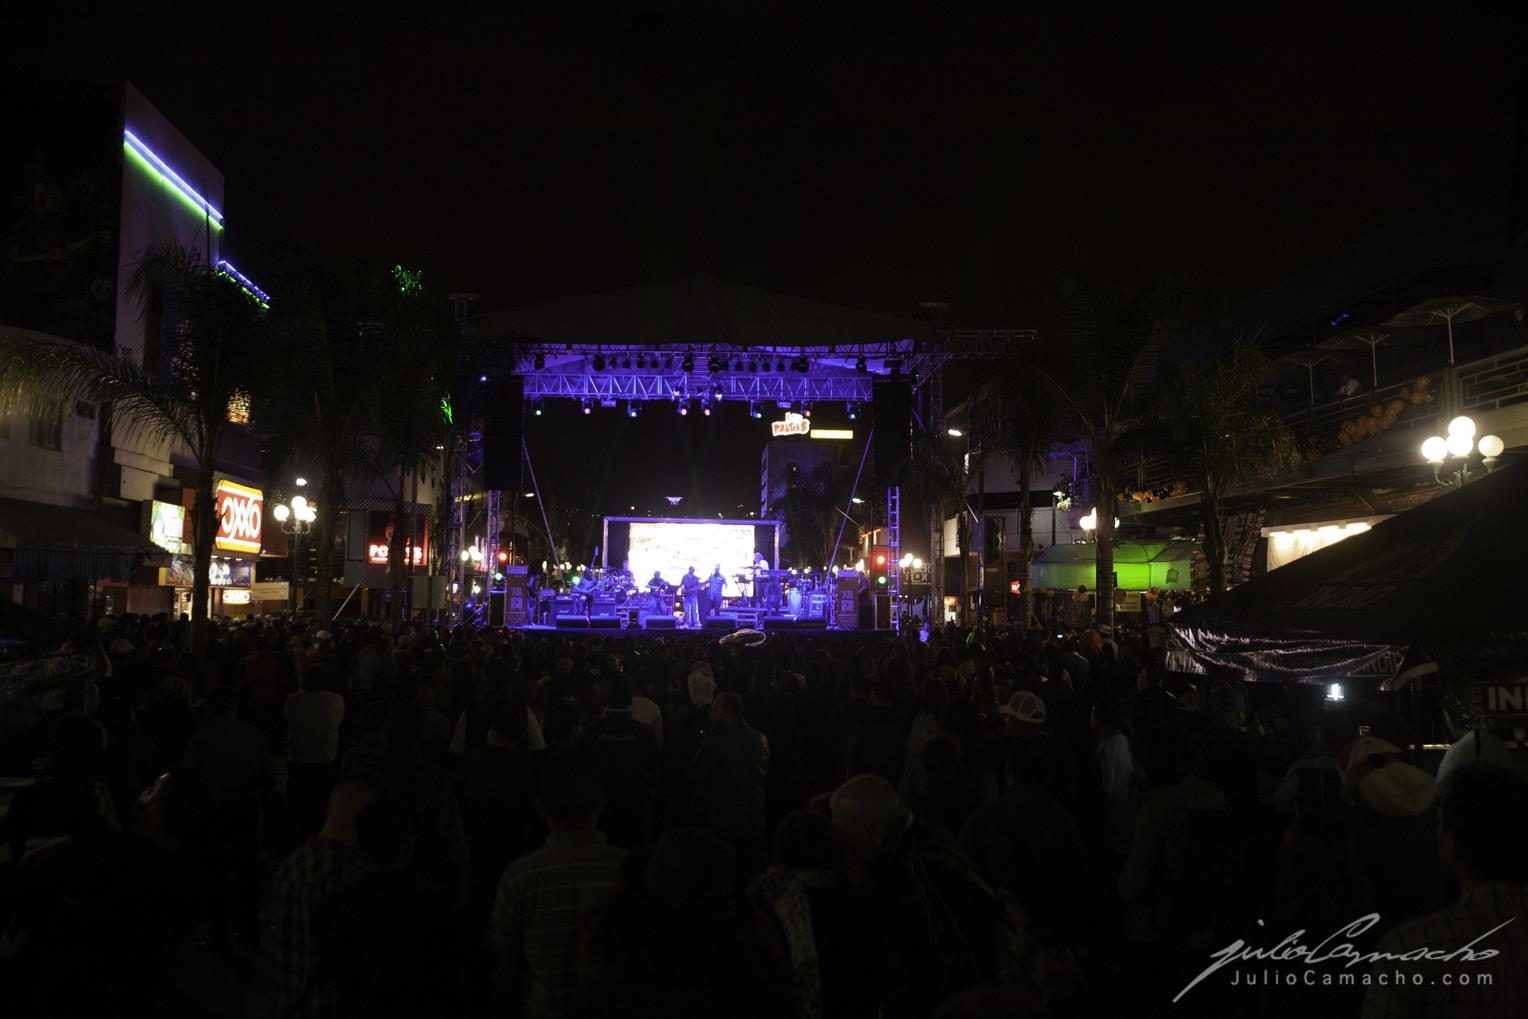 2014-10-30 31 CAST TOUR Ensenada y Tijuana - 1463 - www.Juli (Copy).jpg